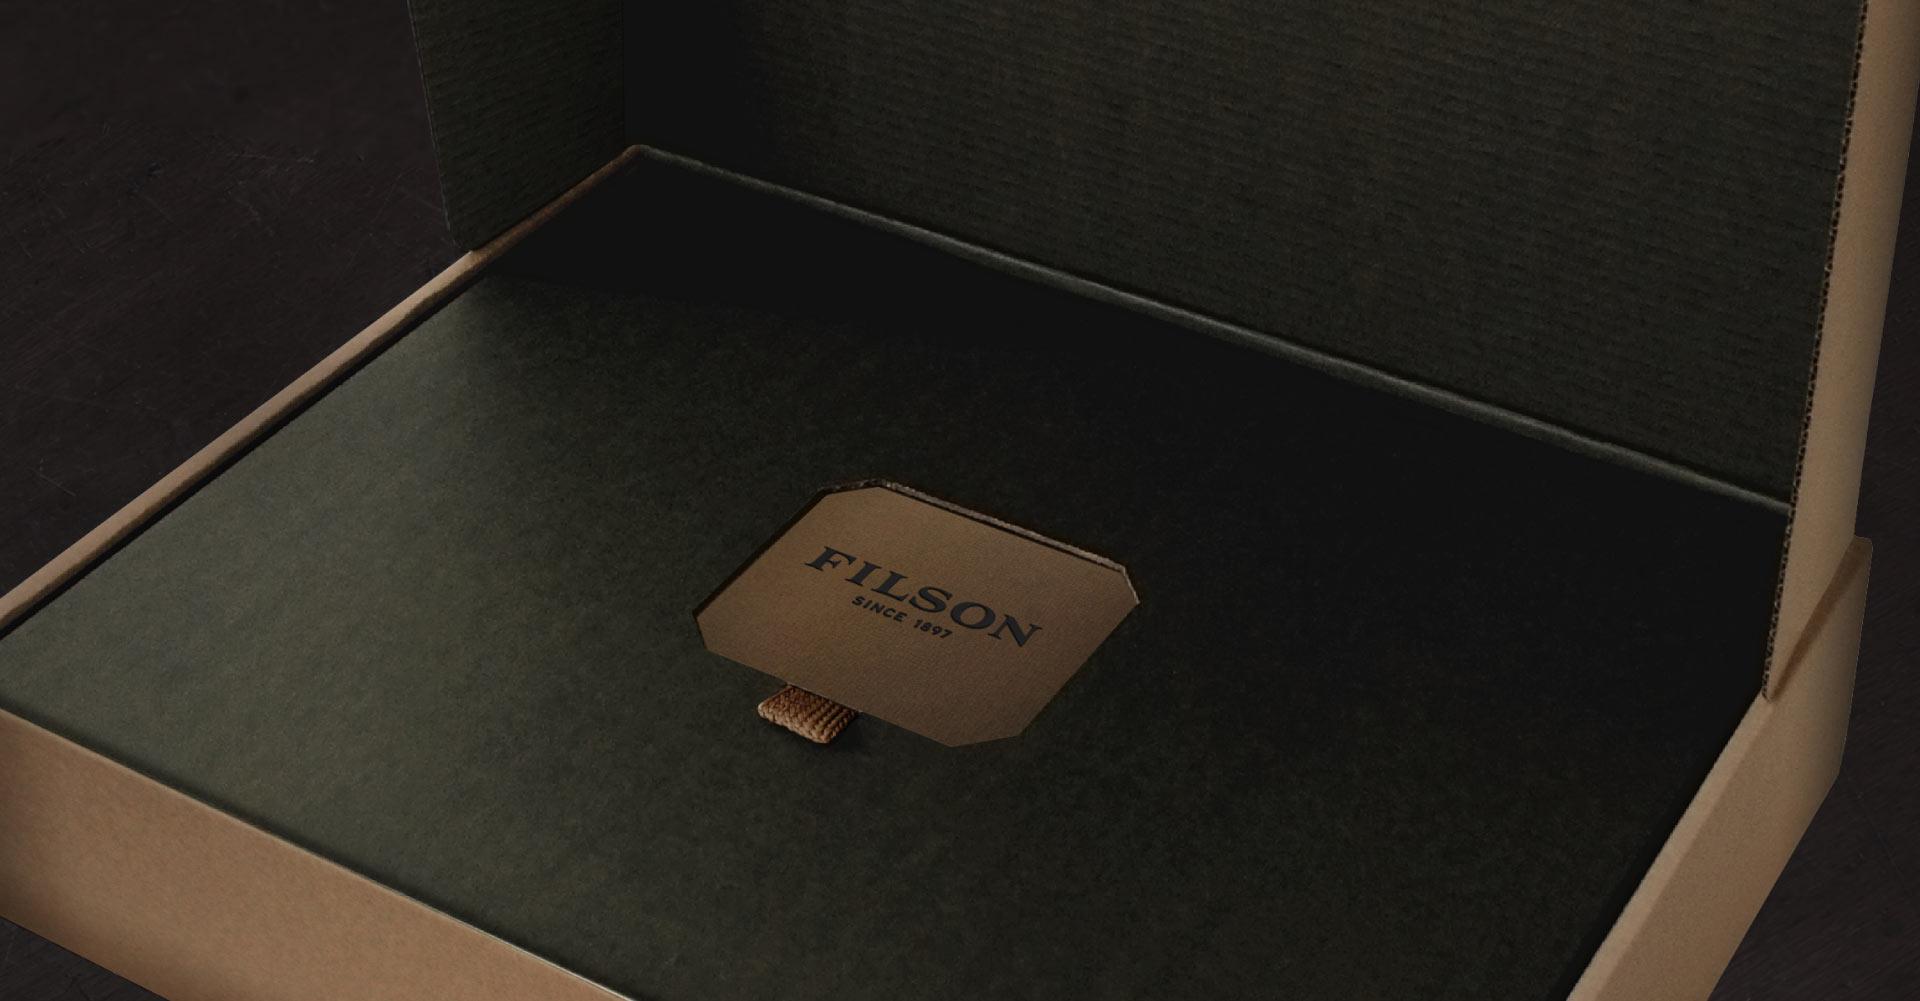 Creative_Retail_Packaging_Custom_Packaging_Structural_Design_Filson_06.jpg